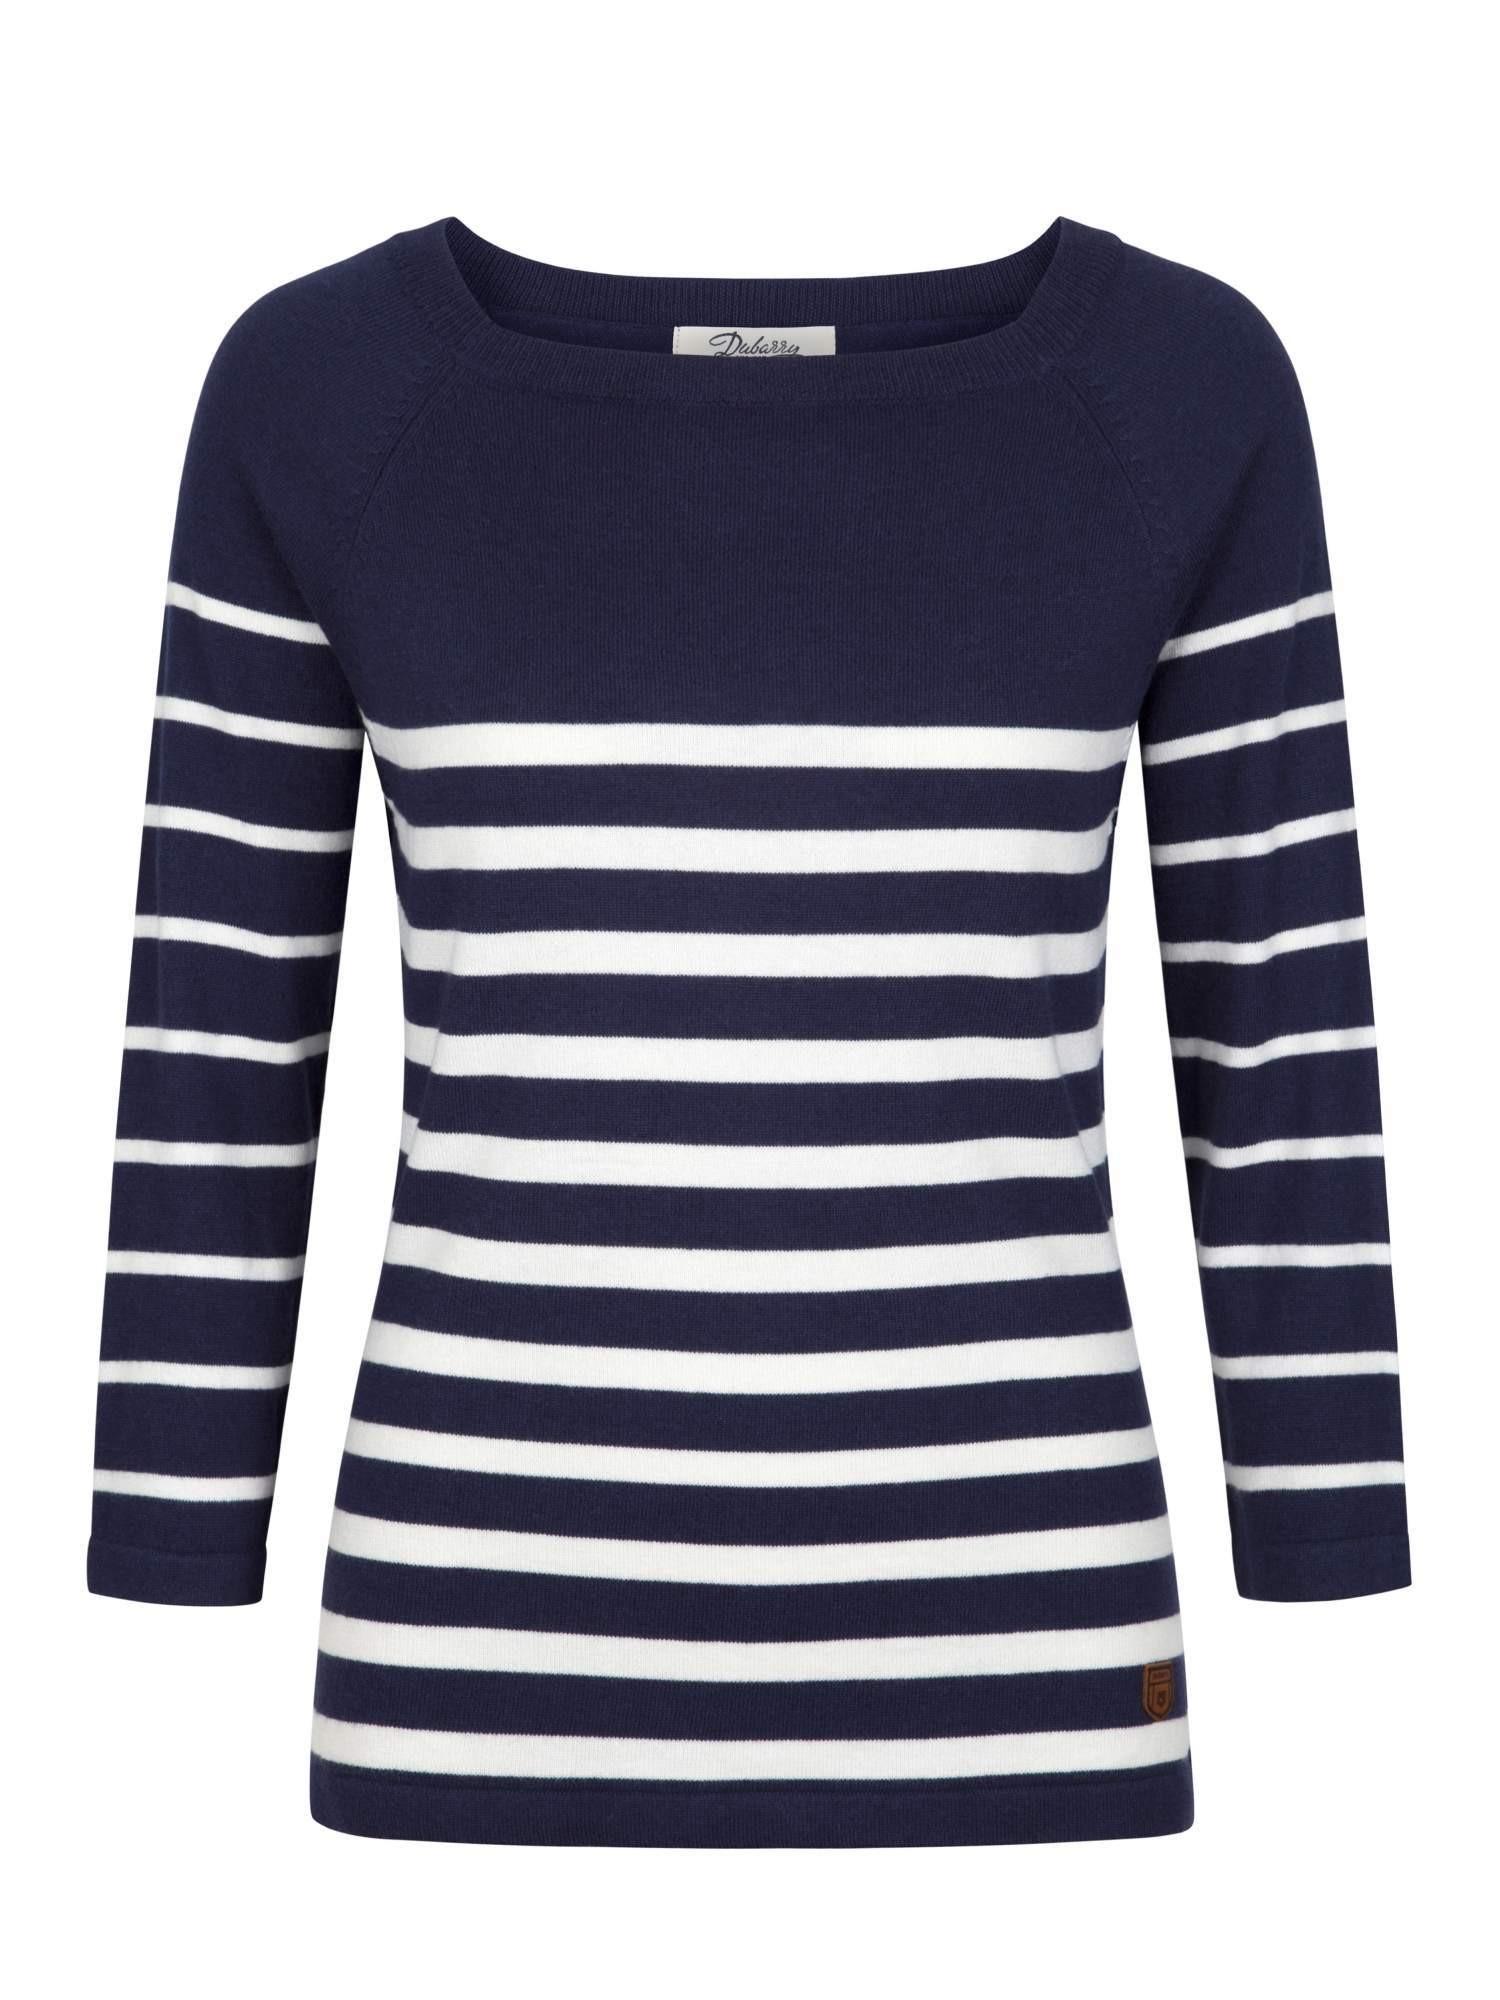 Oakley Gauge 8 >> Dubarry Martello Ladies Sweater Navy